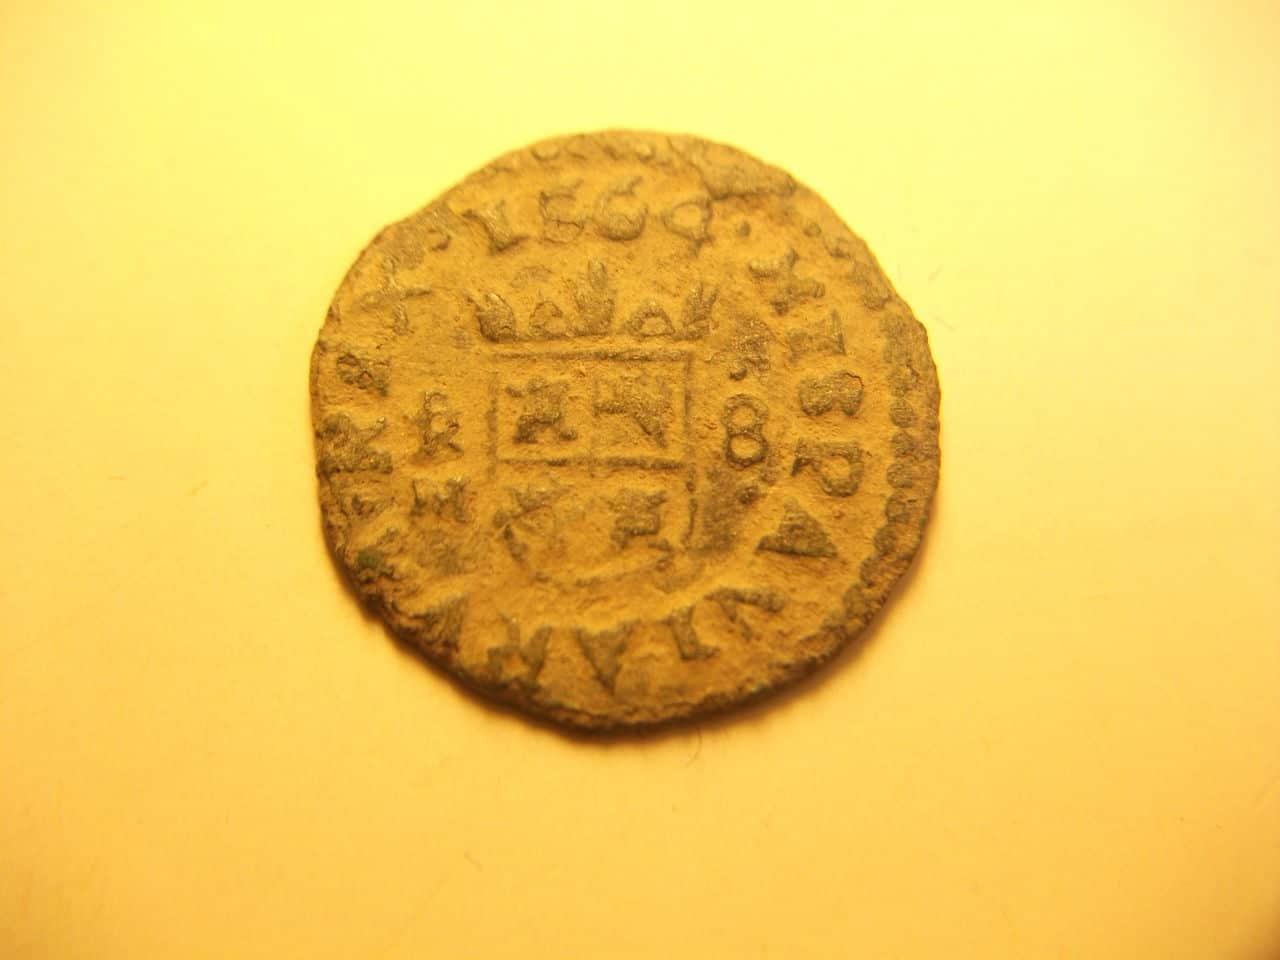 8 maravedis de 1664. Felipe IV, ceca de Trujillo DSCF2042